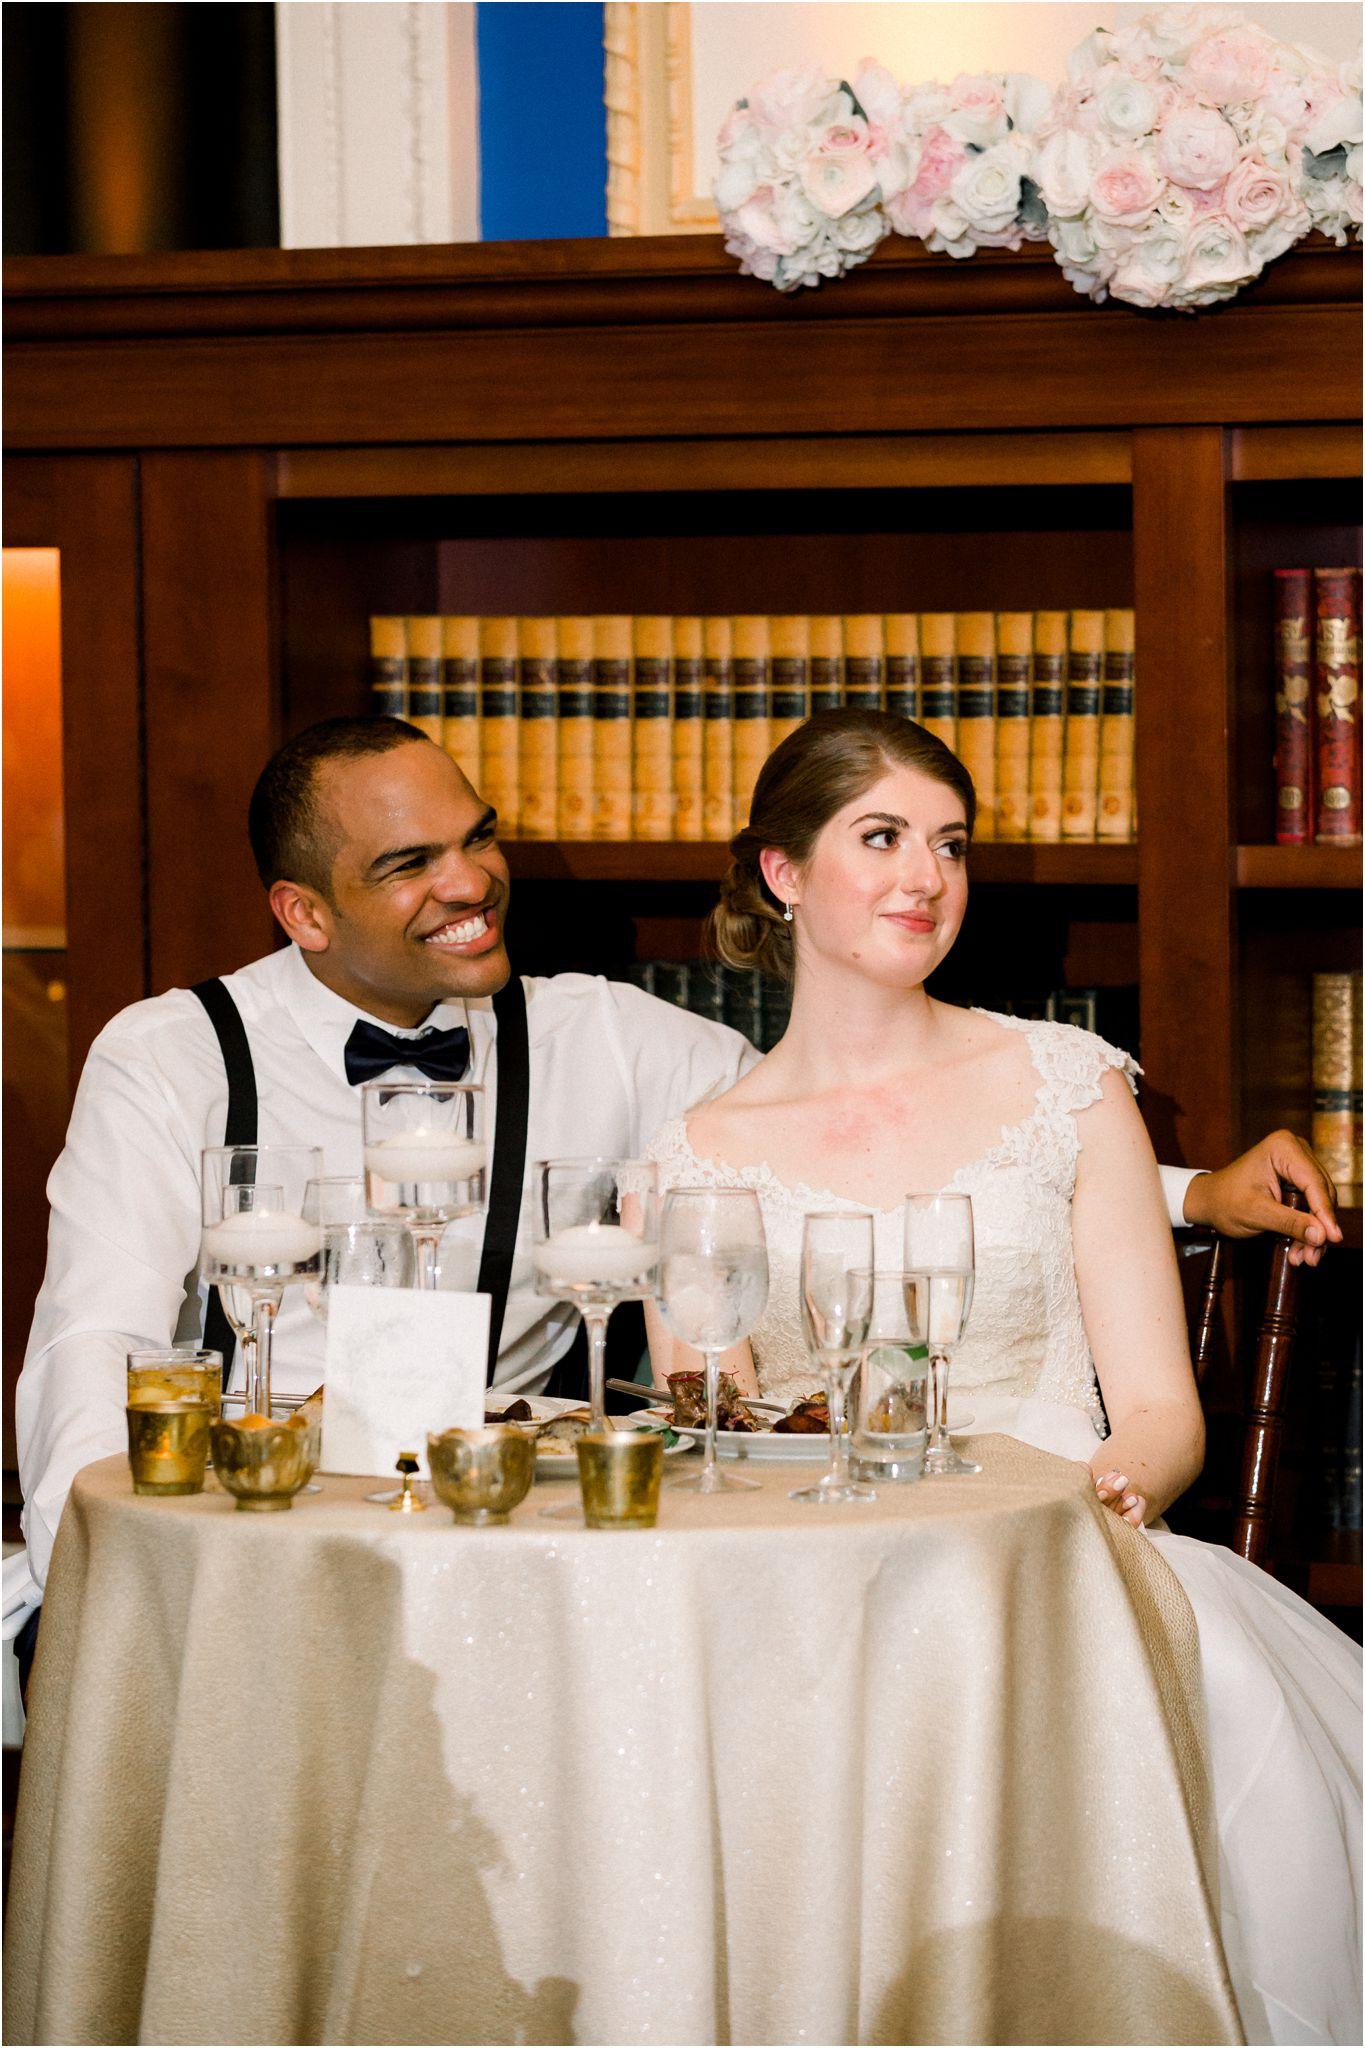 providence-public-library-wedding-images_00043.JPG